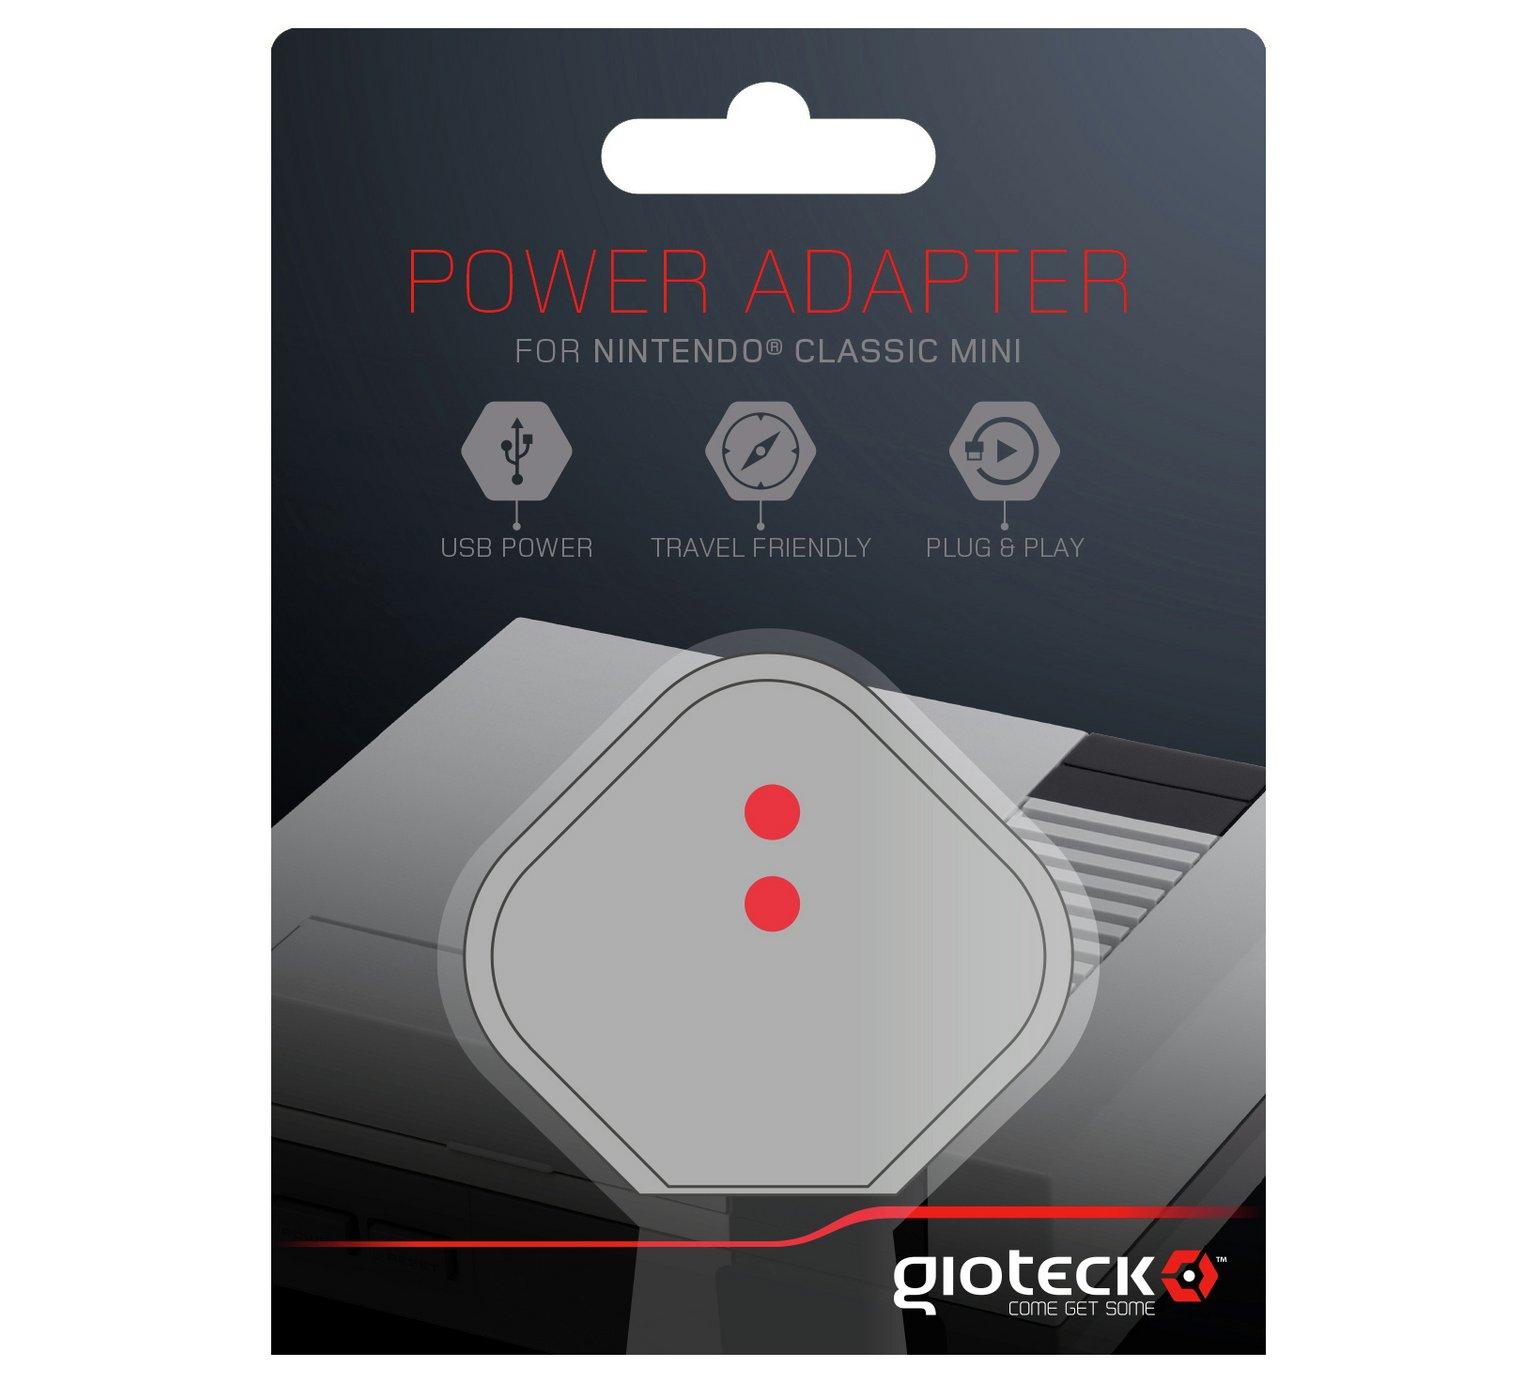 Nintendo Classic Mini: Power Adapter UK £4.99 @ Smyths